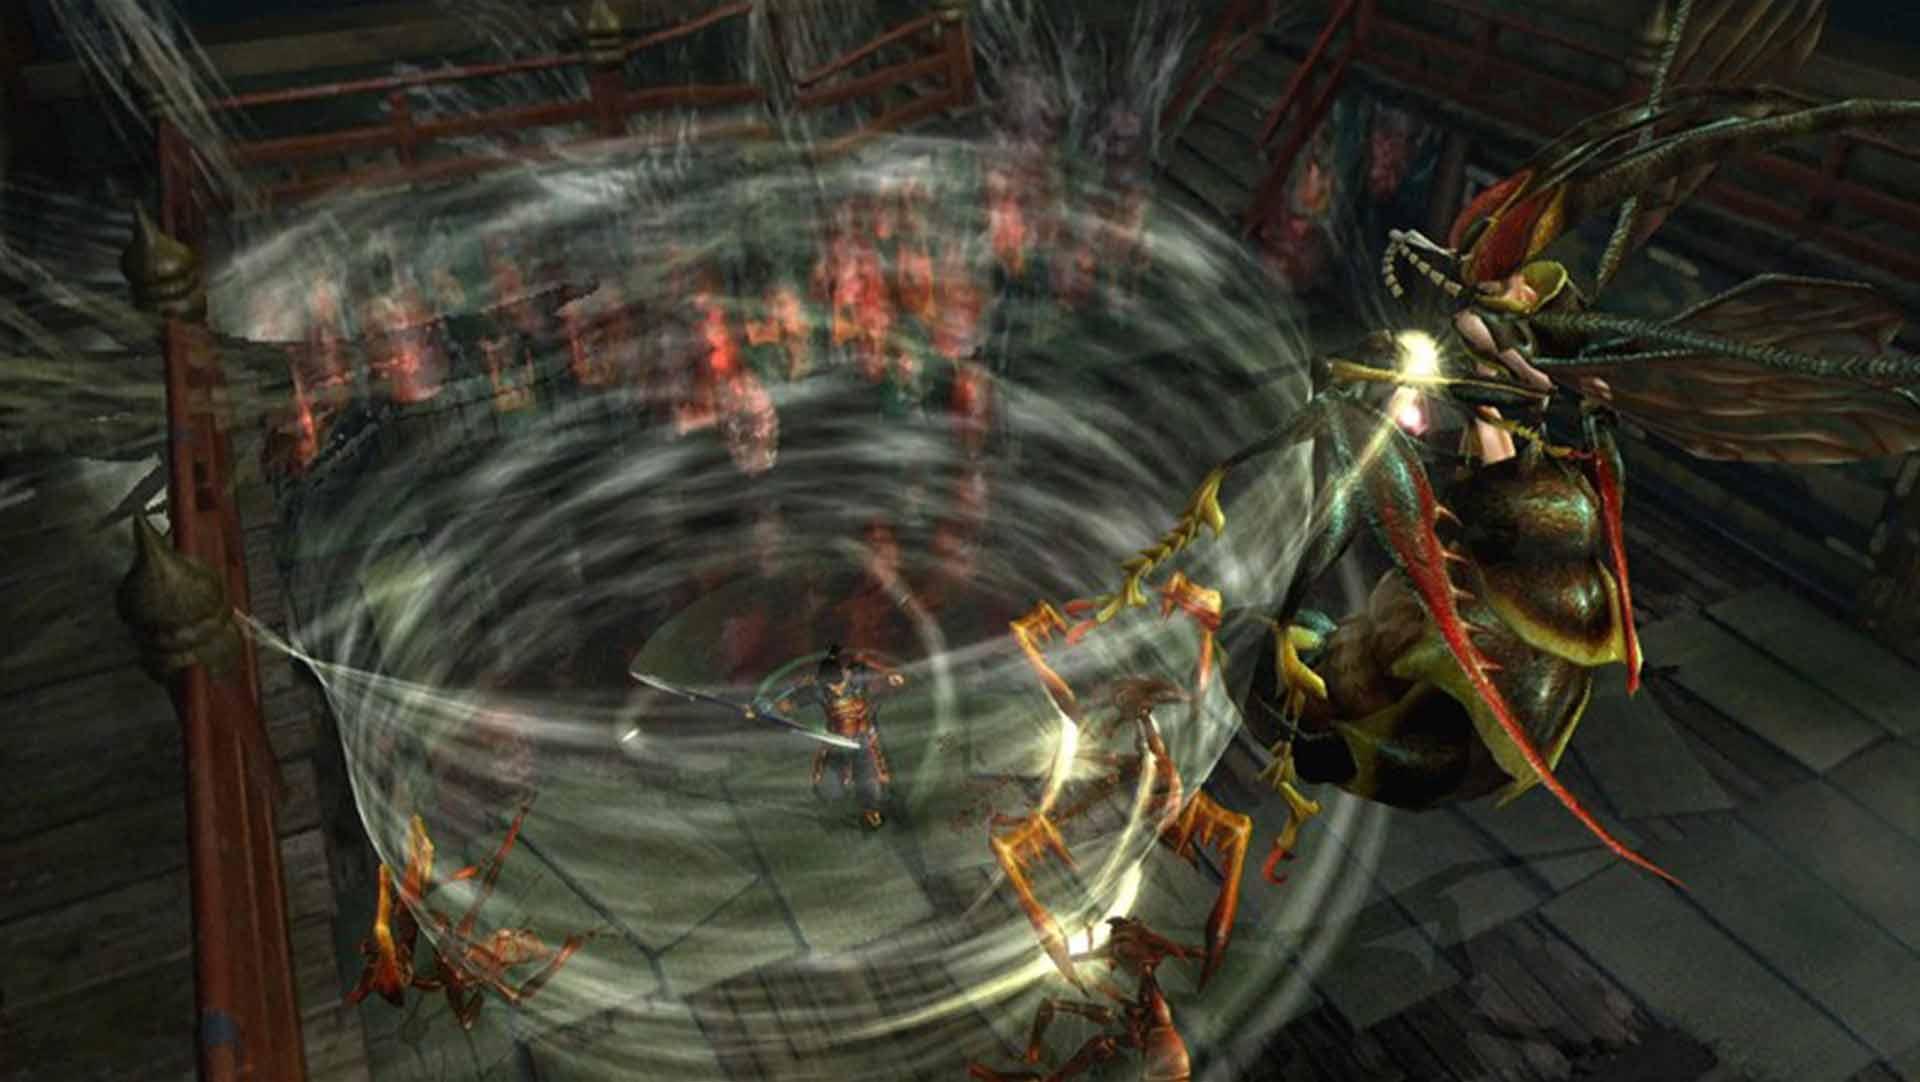 Onimusha: Warlords / 鬼武者 game image